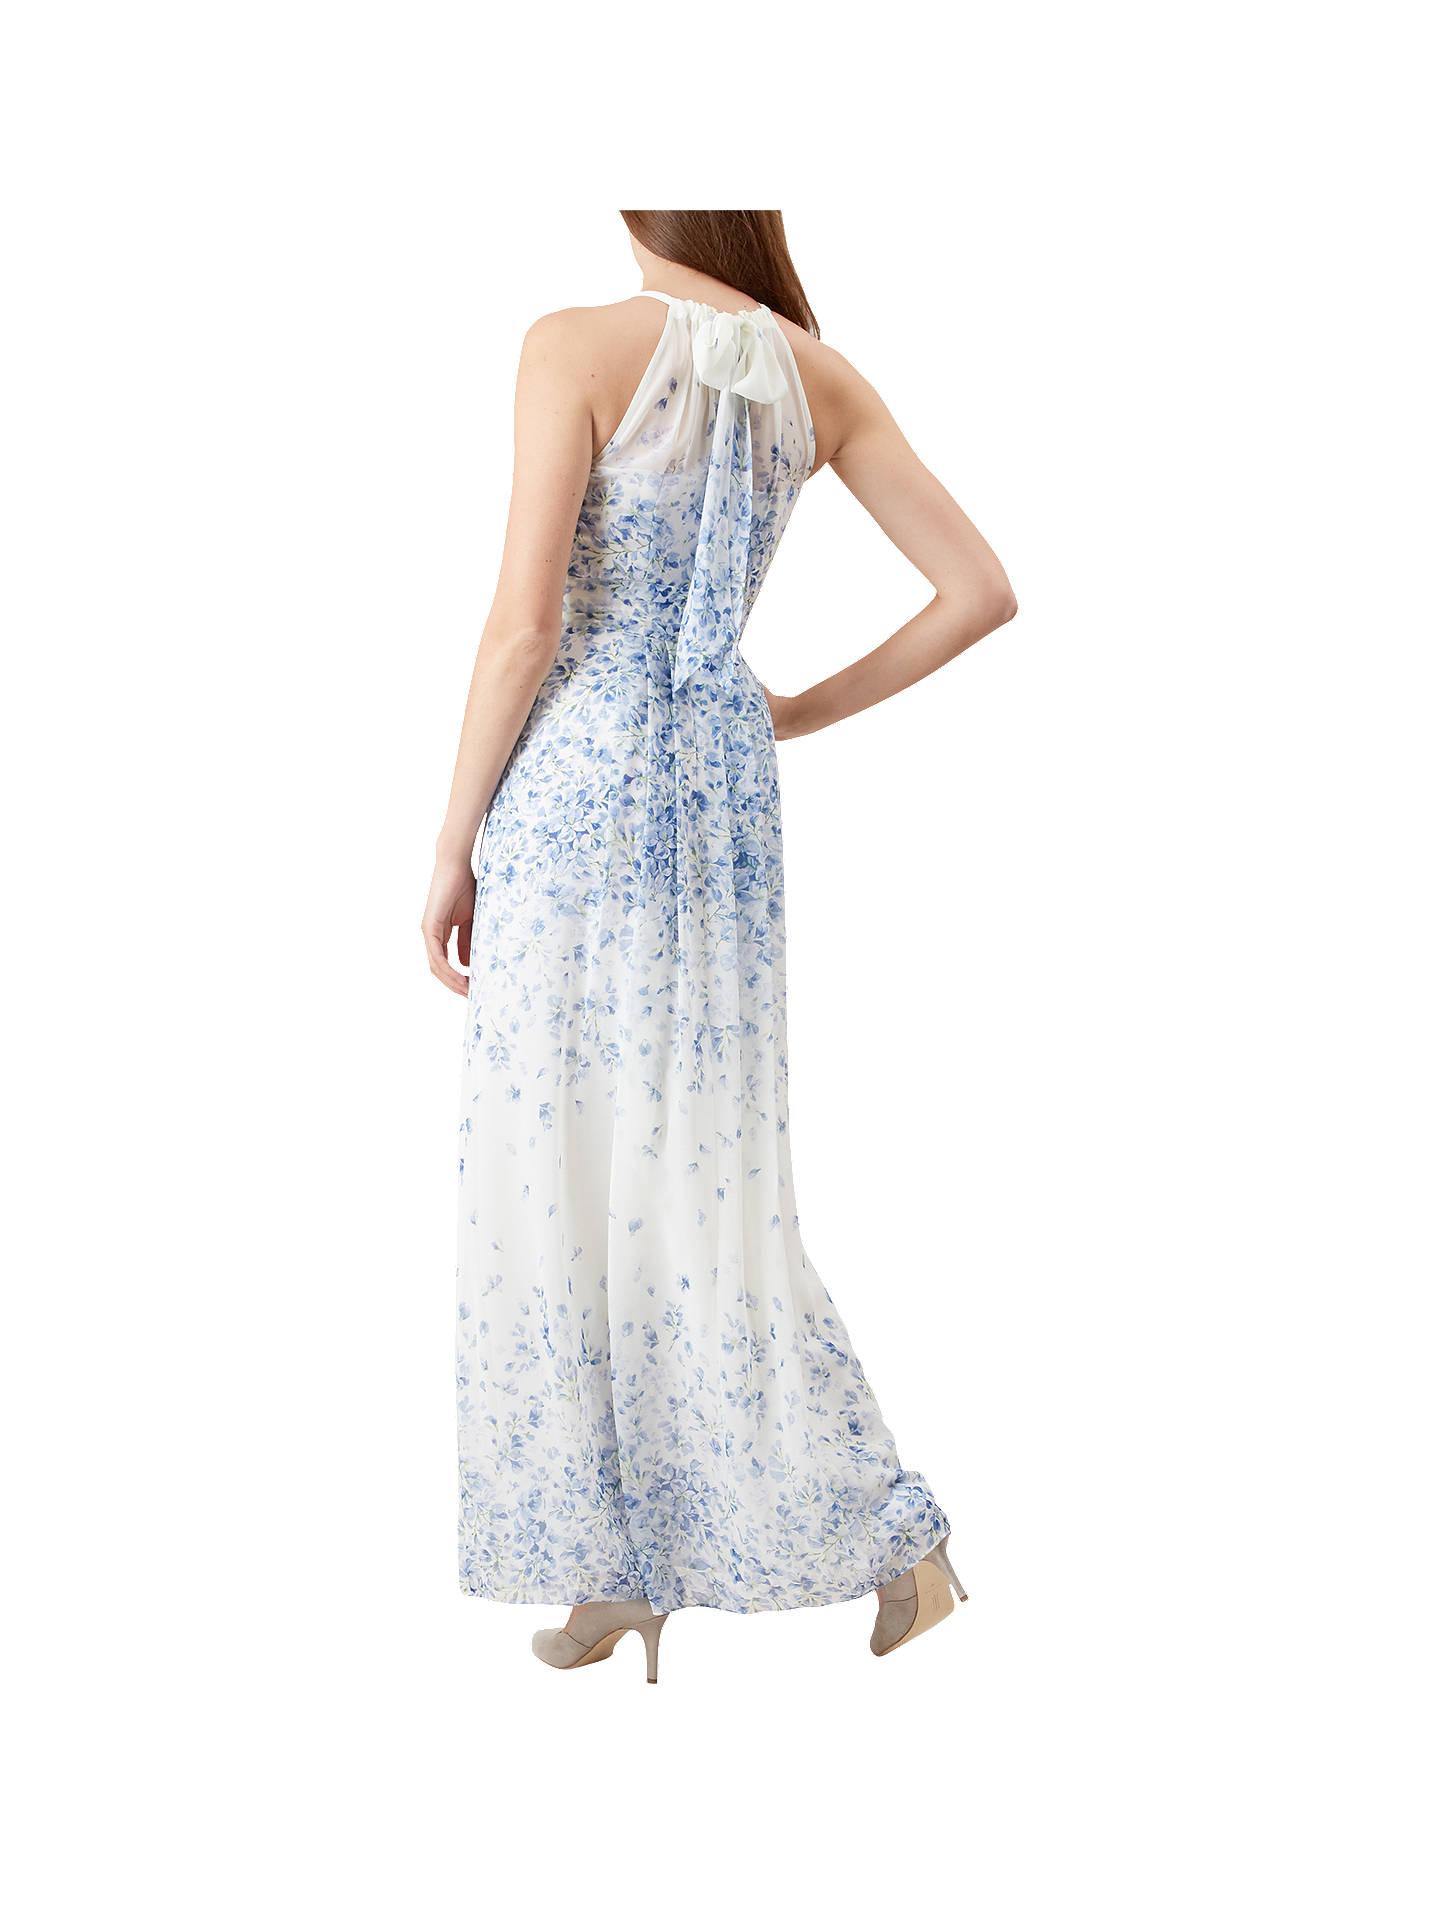 adb98712263 ... Buy Hobbs Alexis Maxi Dress